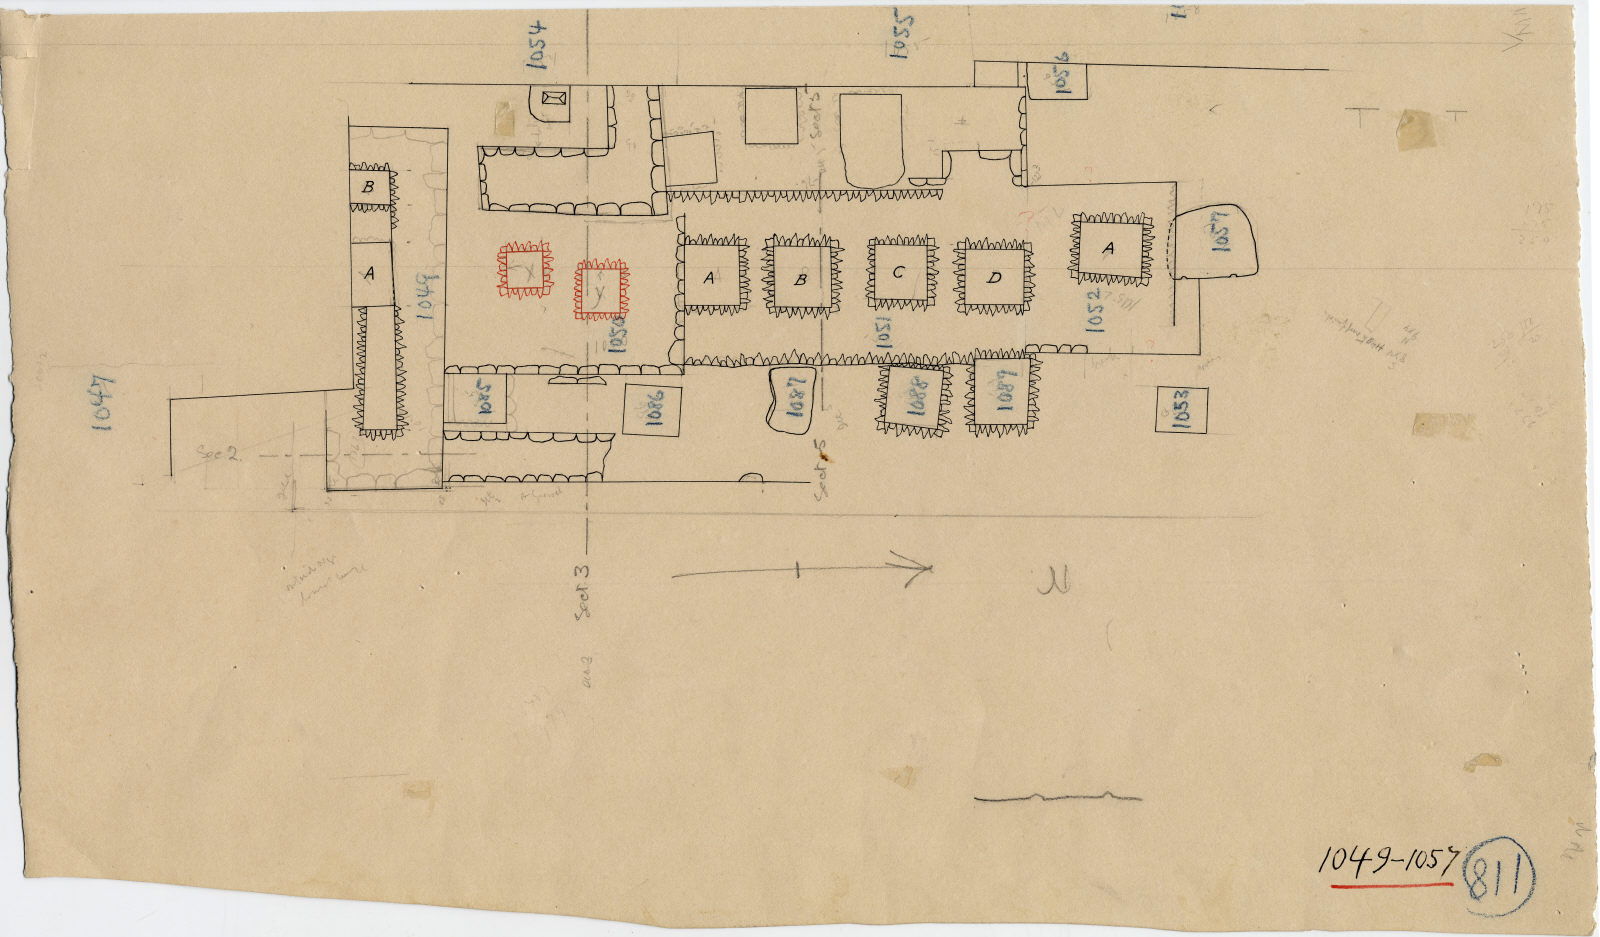 Maps and plans: Plan of G 1047, G 1049, G 1050, G 1051, G 1052, G 1053, G 1054, G 1055, G 1056, G 1057, G 1085, G 1086, G 1087, G 1088, G 1089